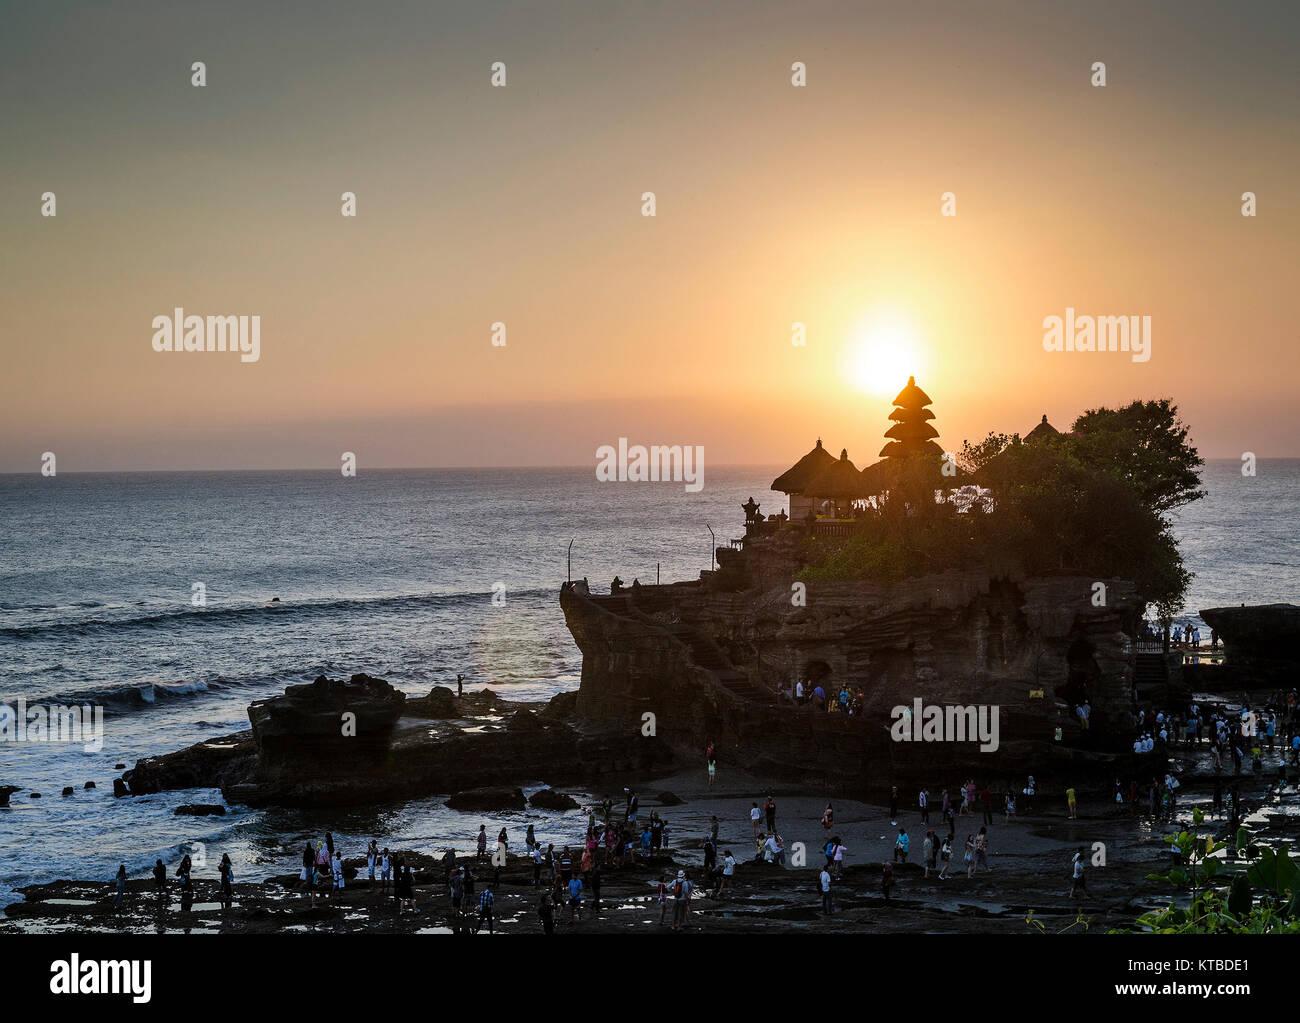 Pura Goa Lawah Hindu Tempel Sonnenuntergang Gegenlicht Silhouette in Bali Indonesien Stockbild